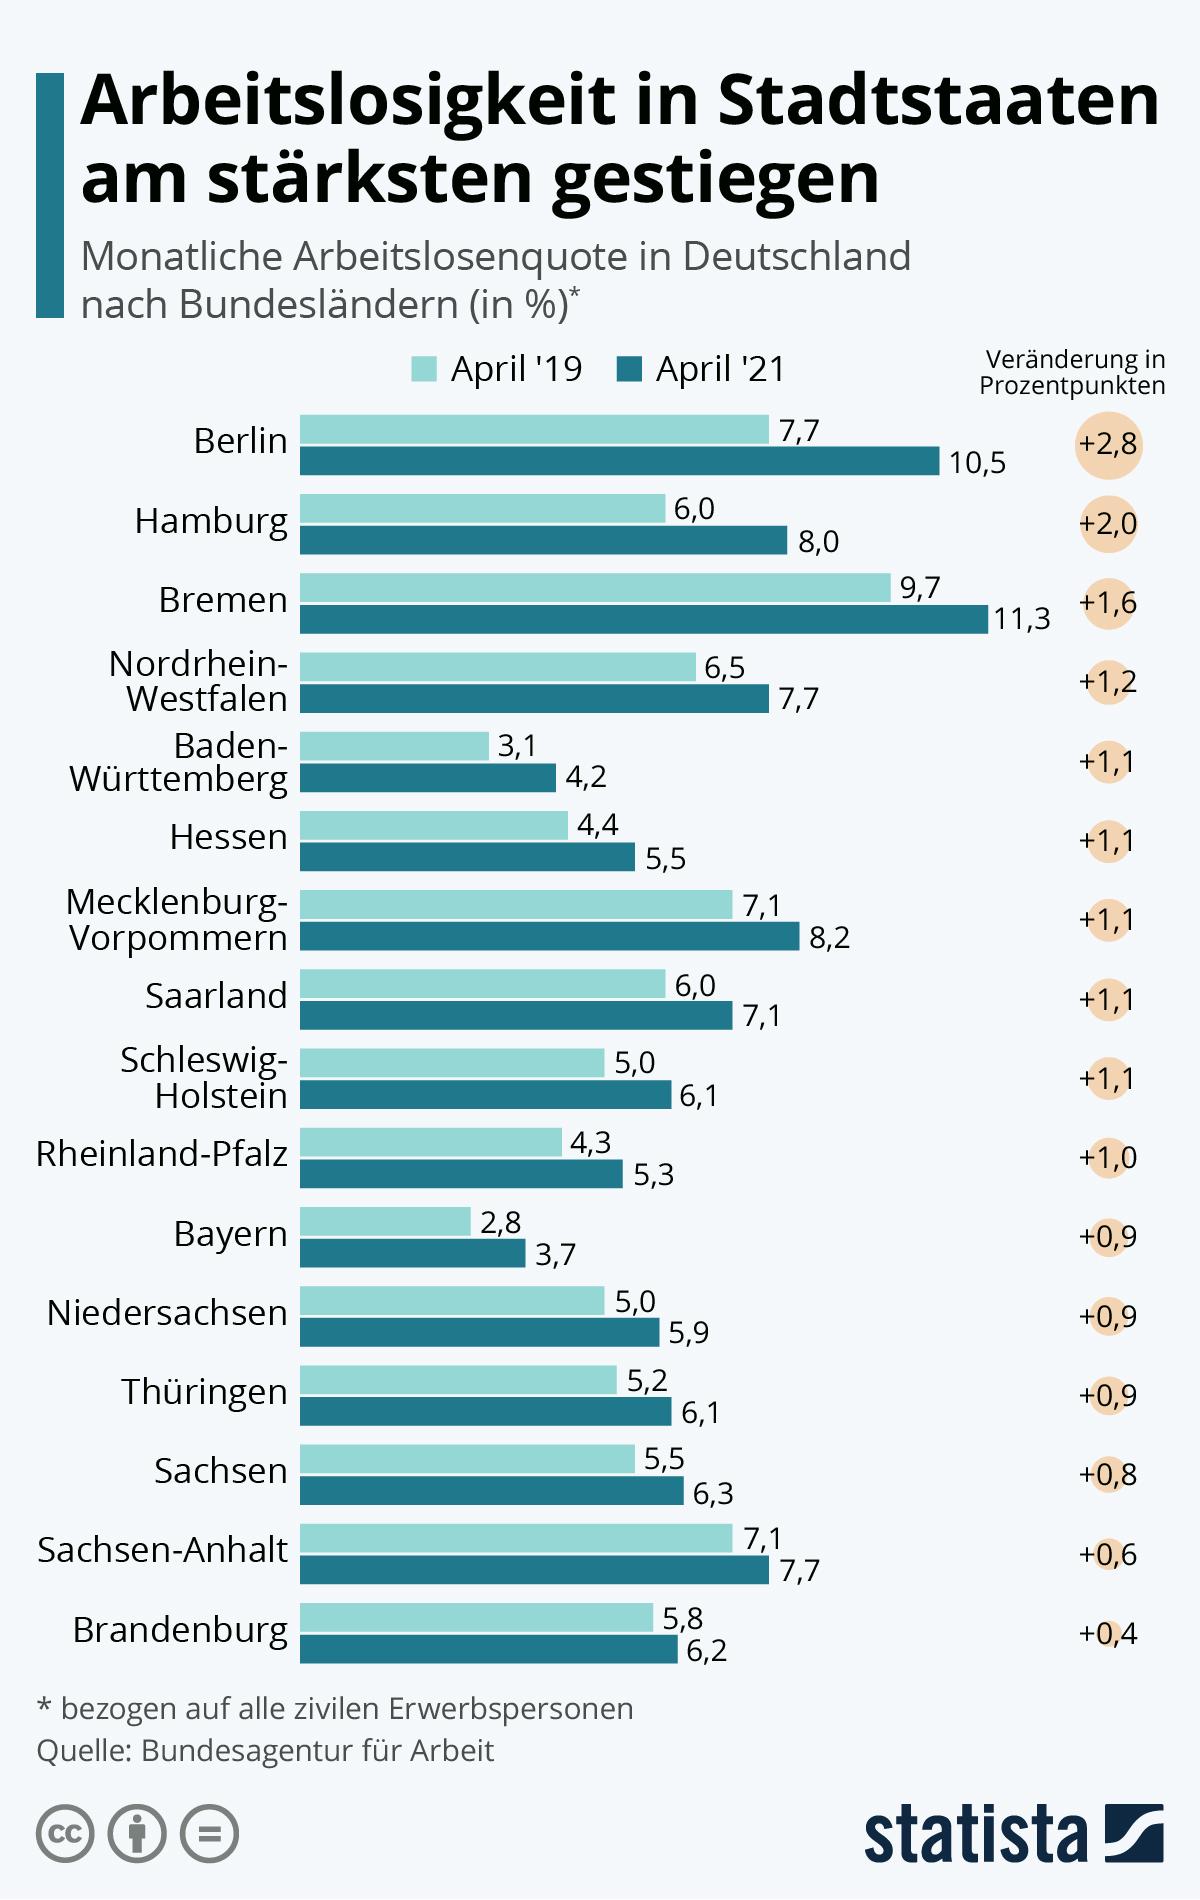 Infografik: Arbeitslosigkeit in Stadtstaaten am stärksten gestiegen | Statista